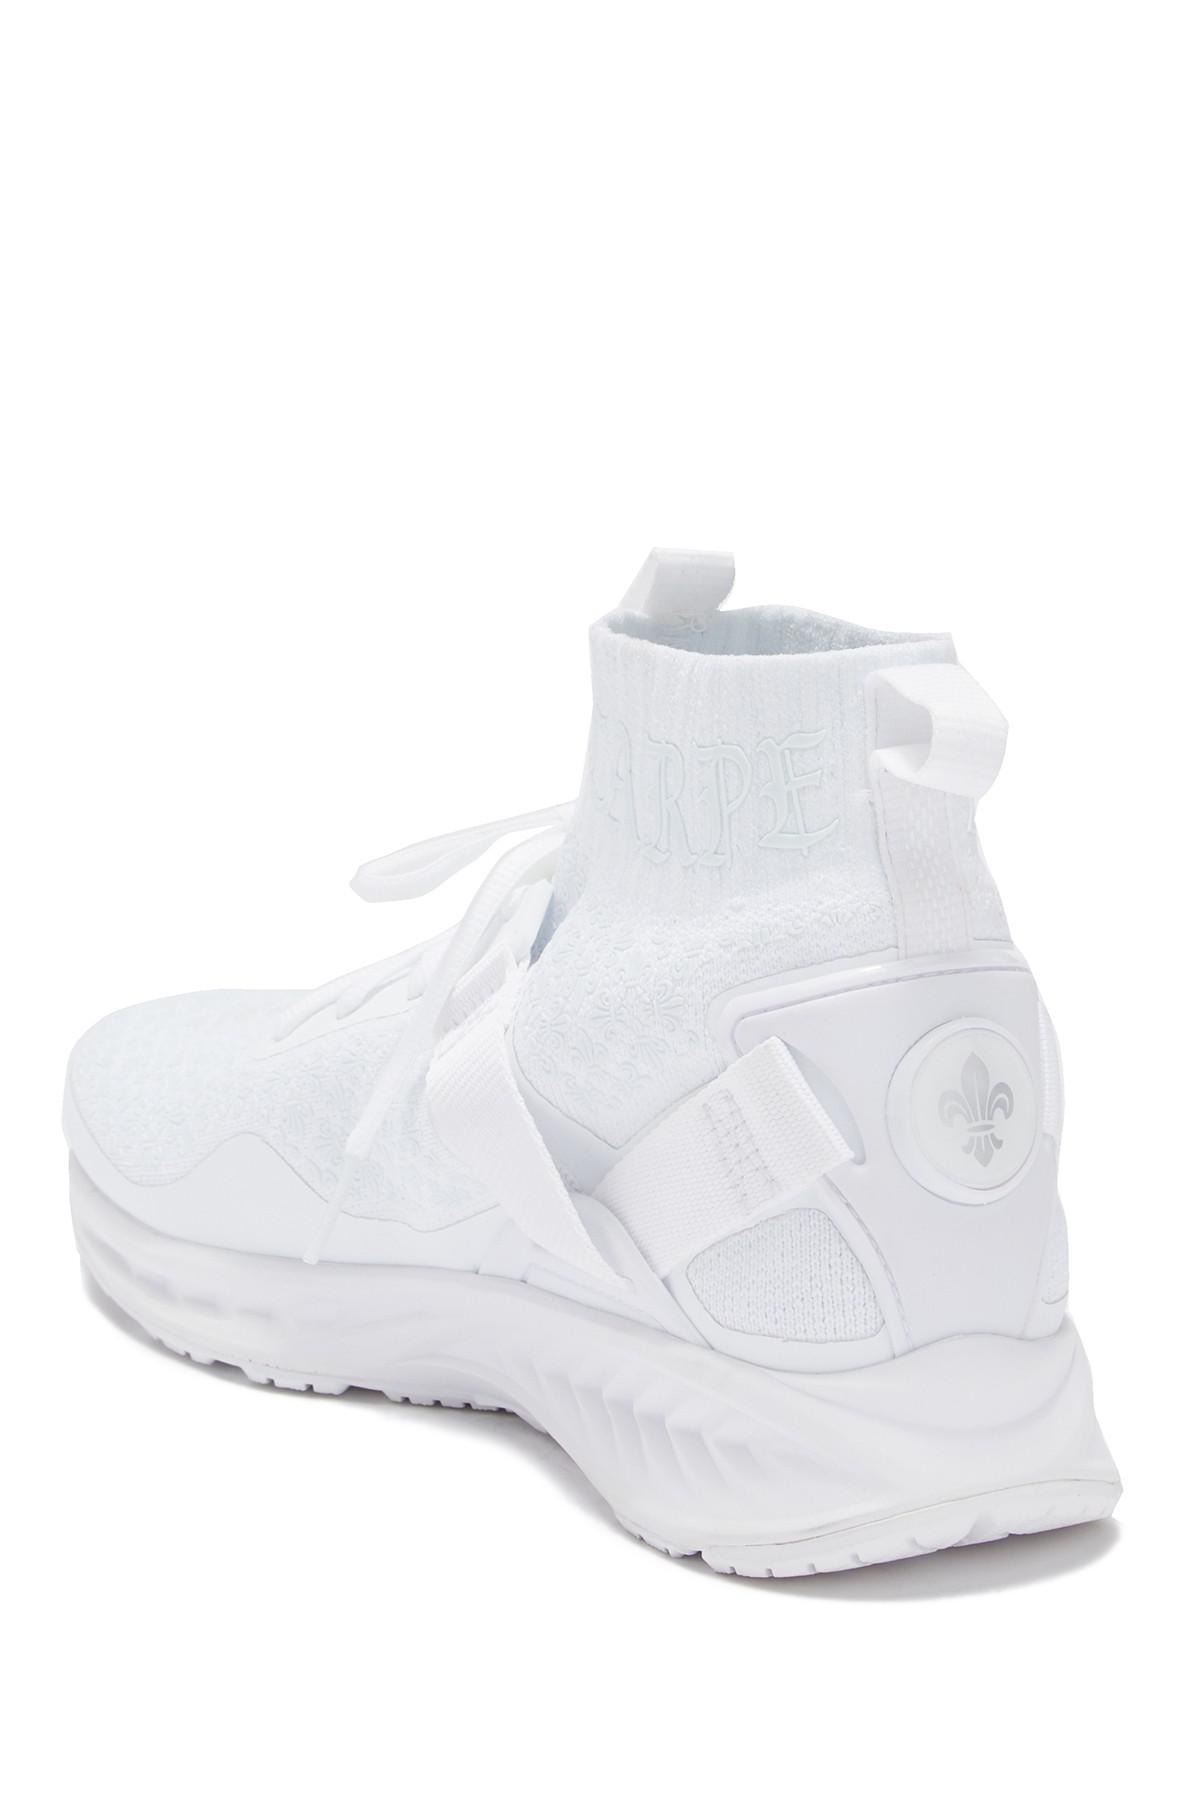 best service a0a13 38a1d PUMA White Ignite Evoknit (en Noir) for men